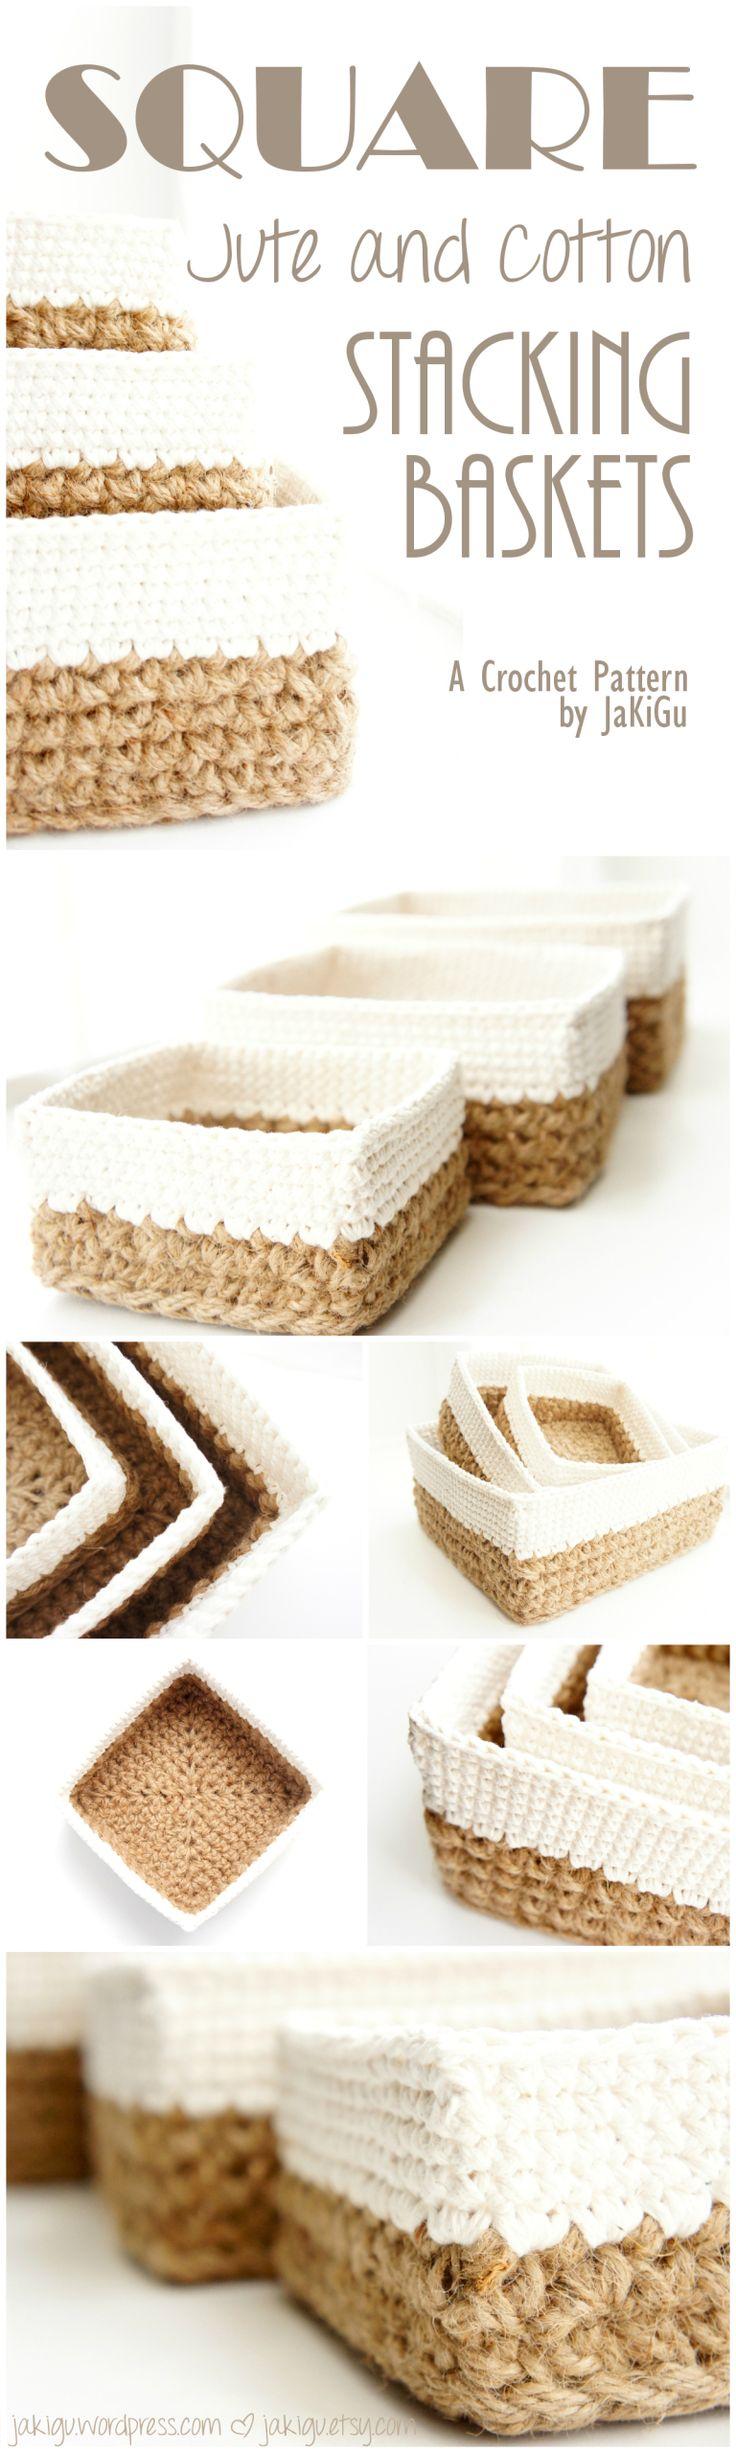 Square Basket - JaKiGu Crochet Pattern